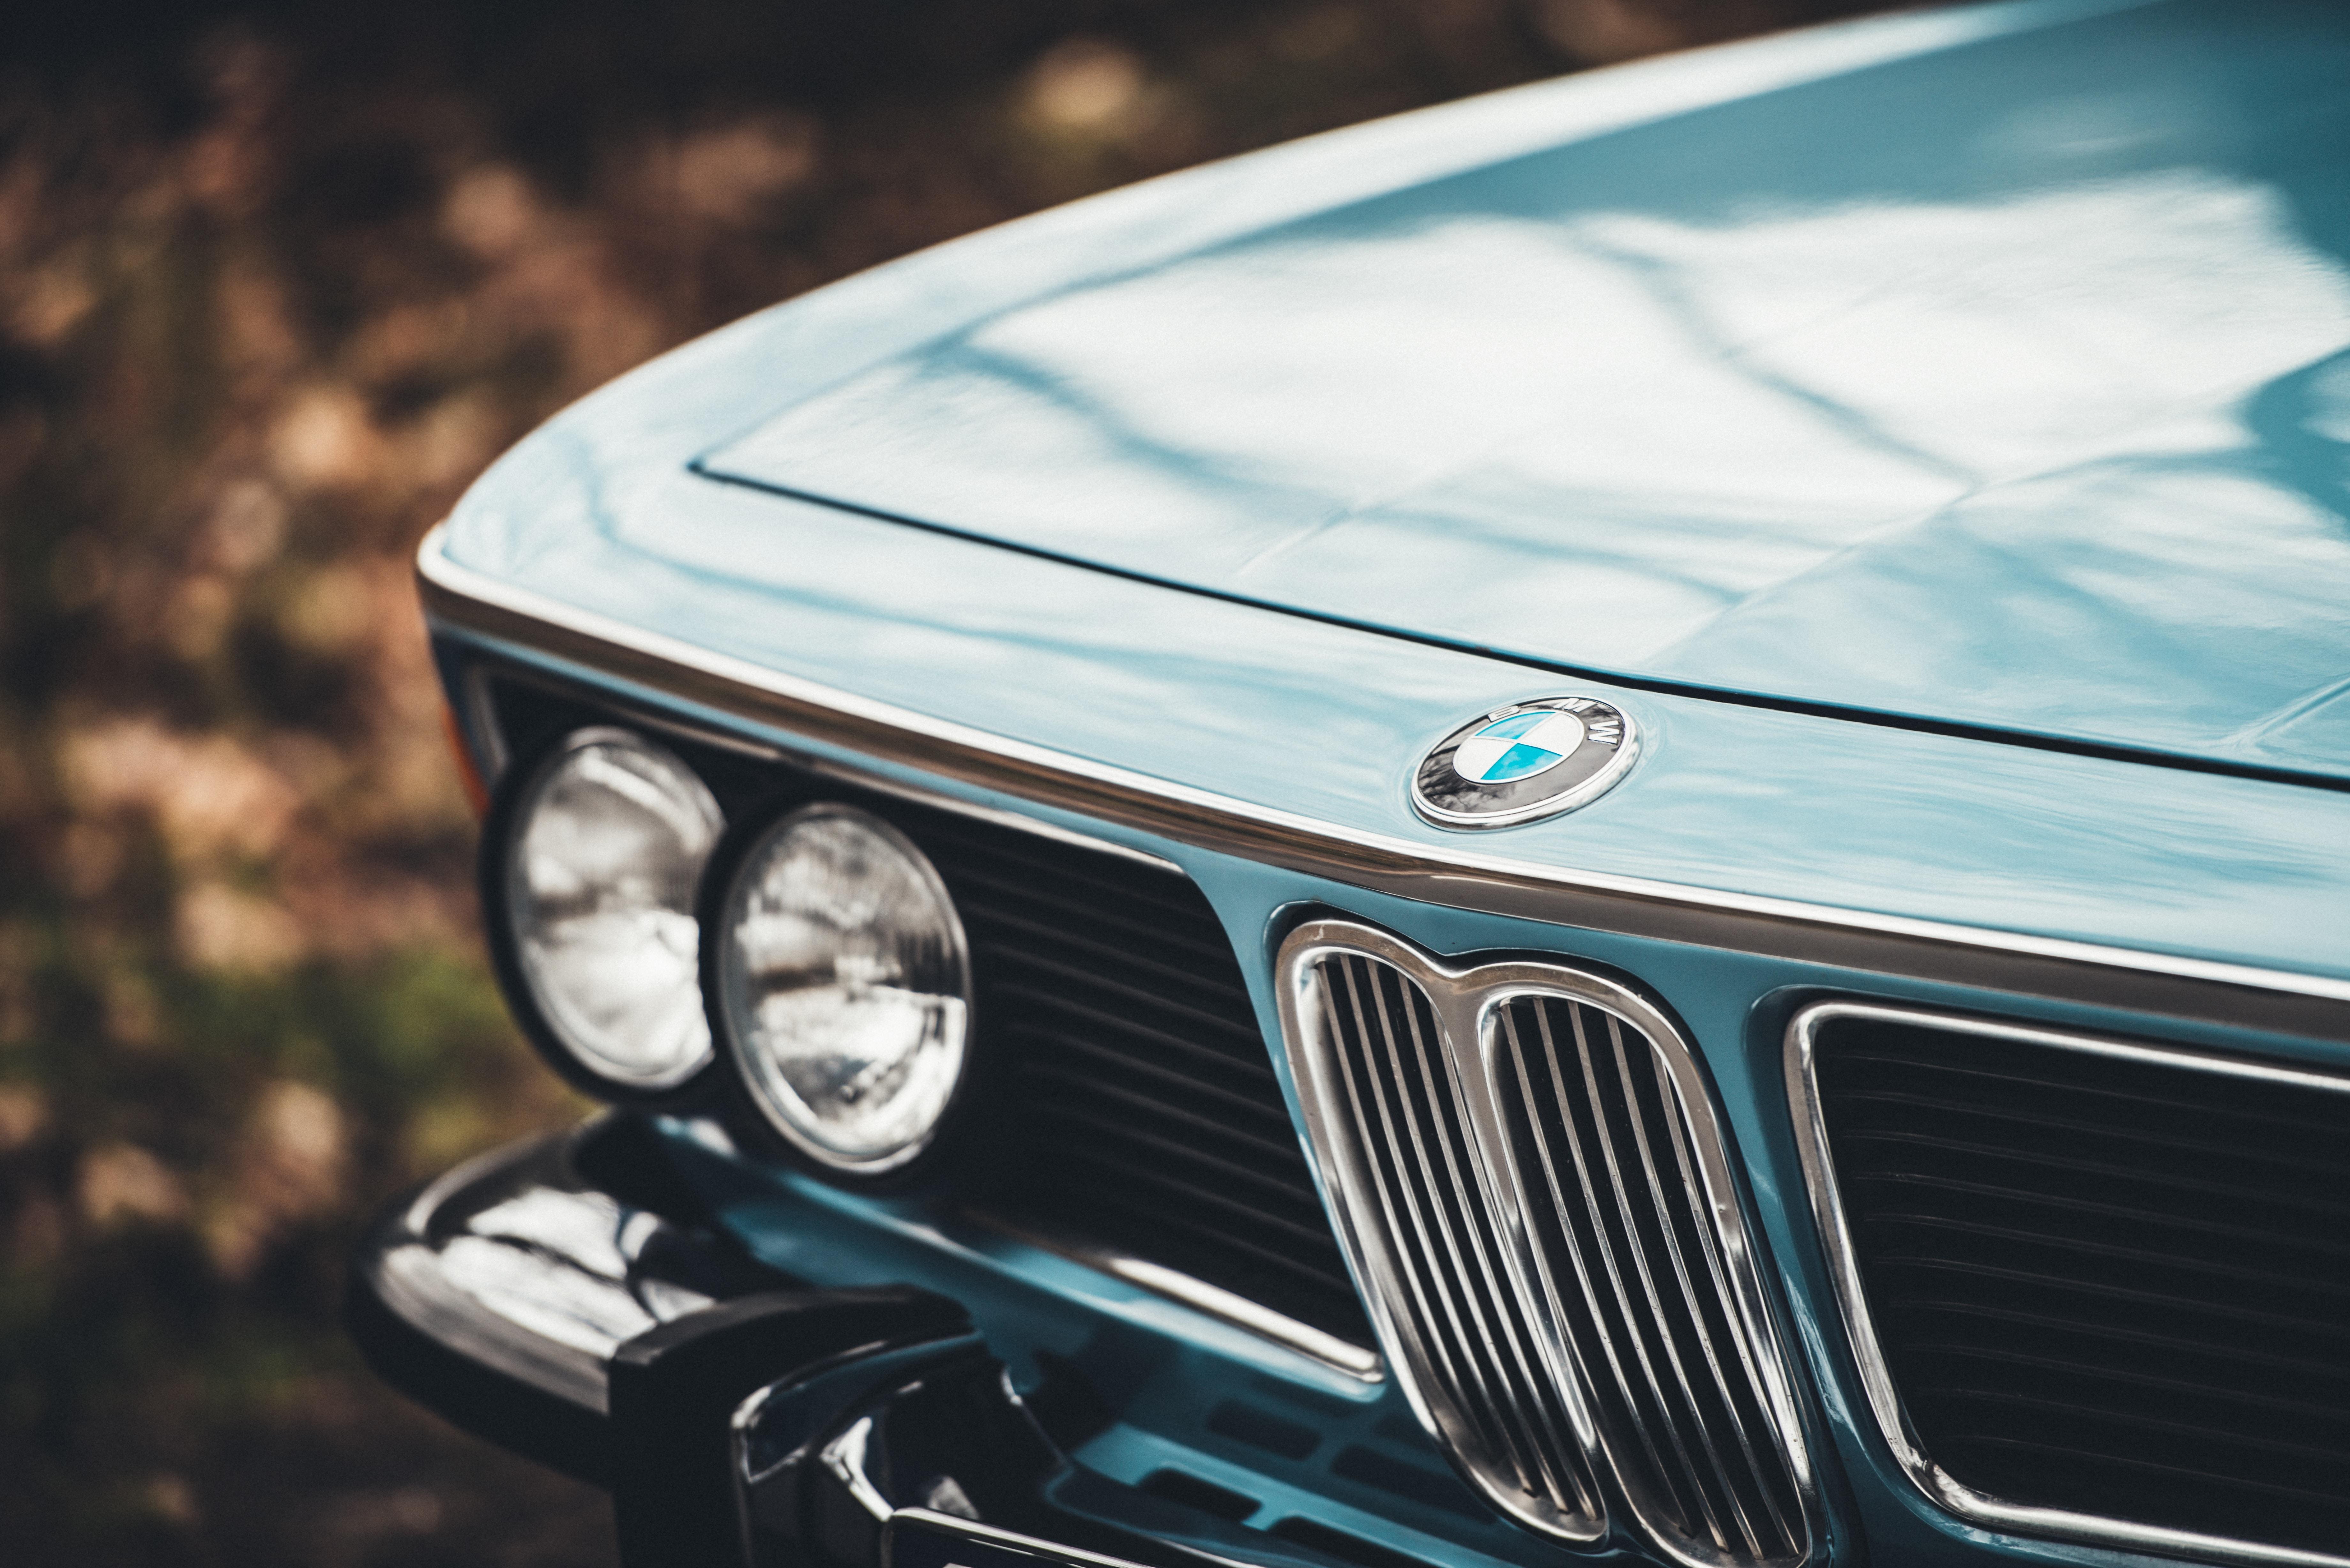 gray BMW car